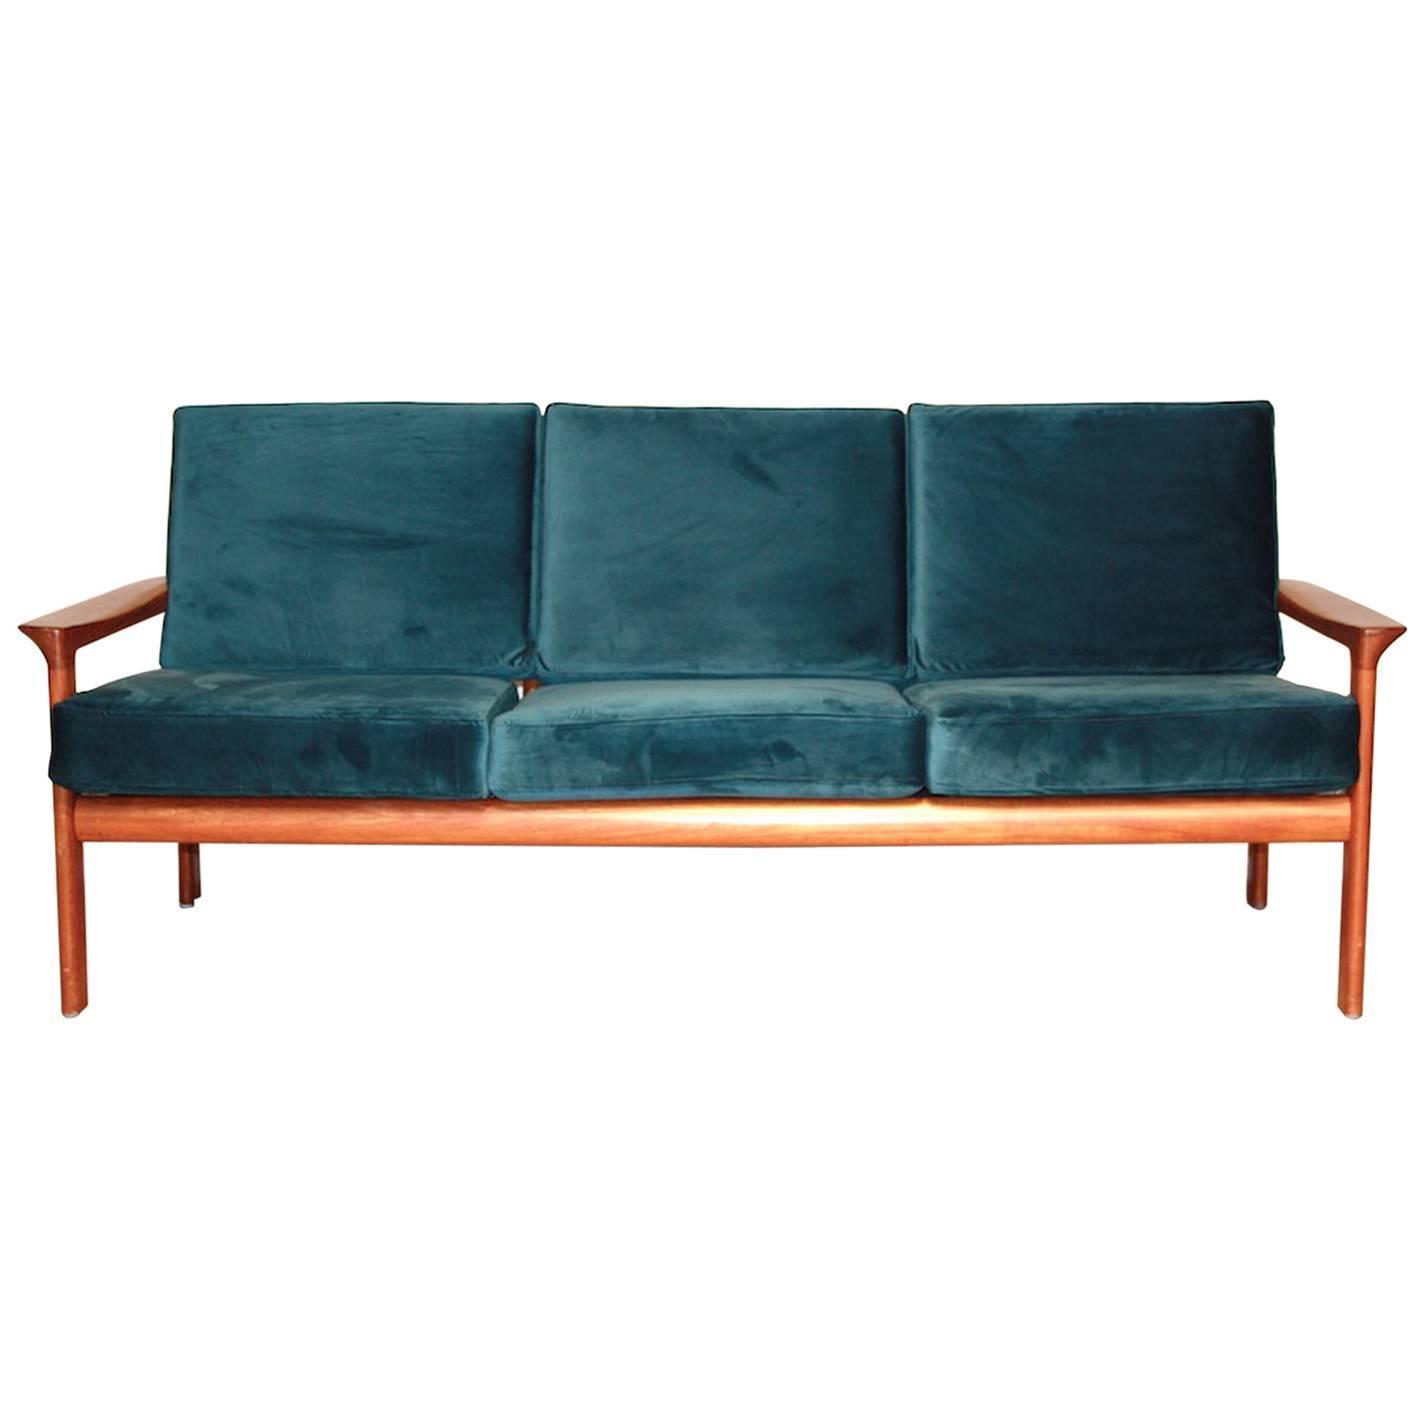 Chaise Vintage Maison Du Monde Chambre Ado Garcon Moderne